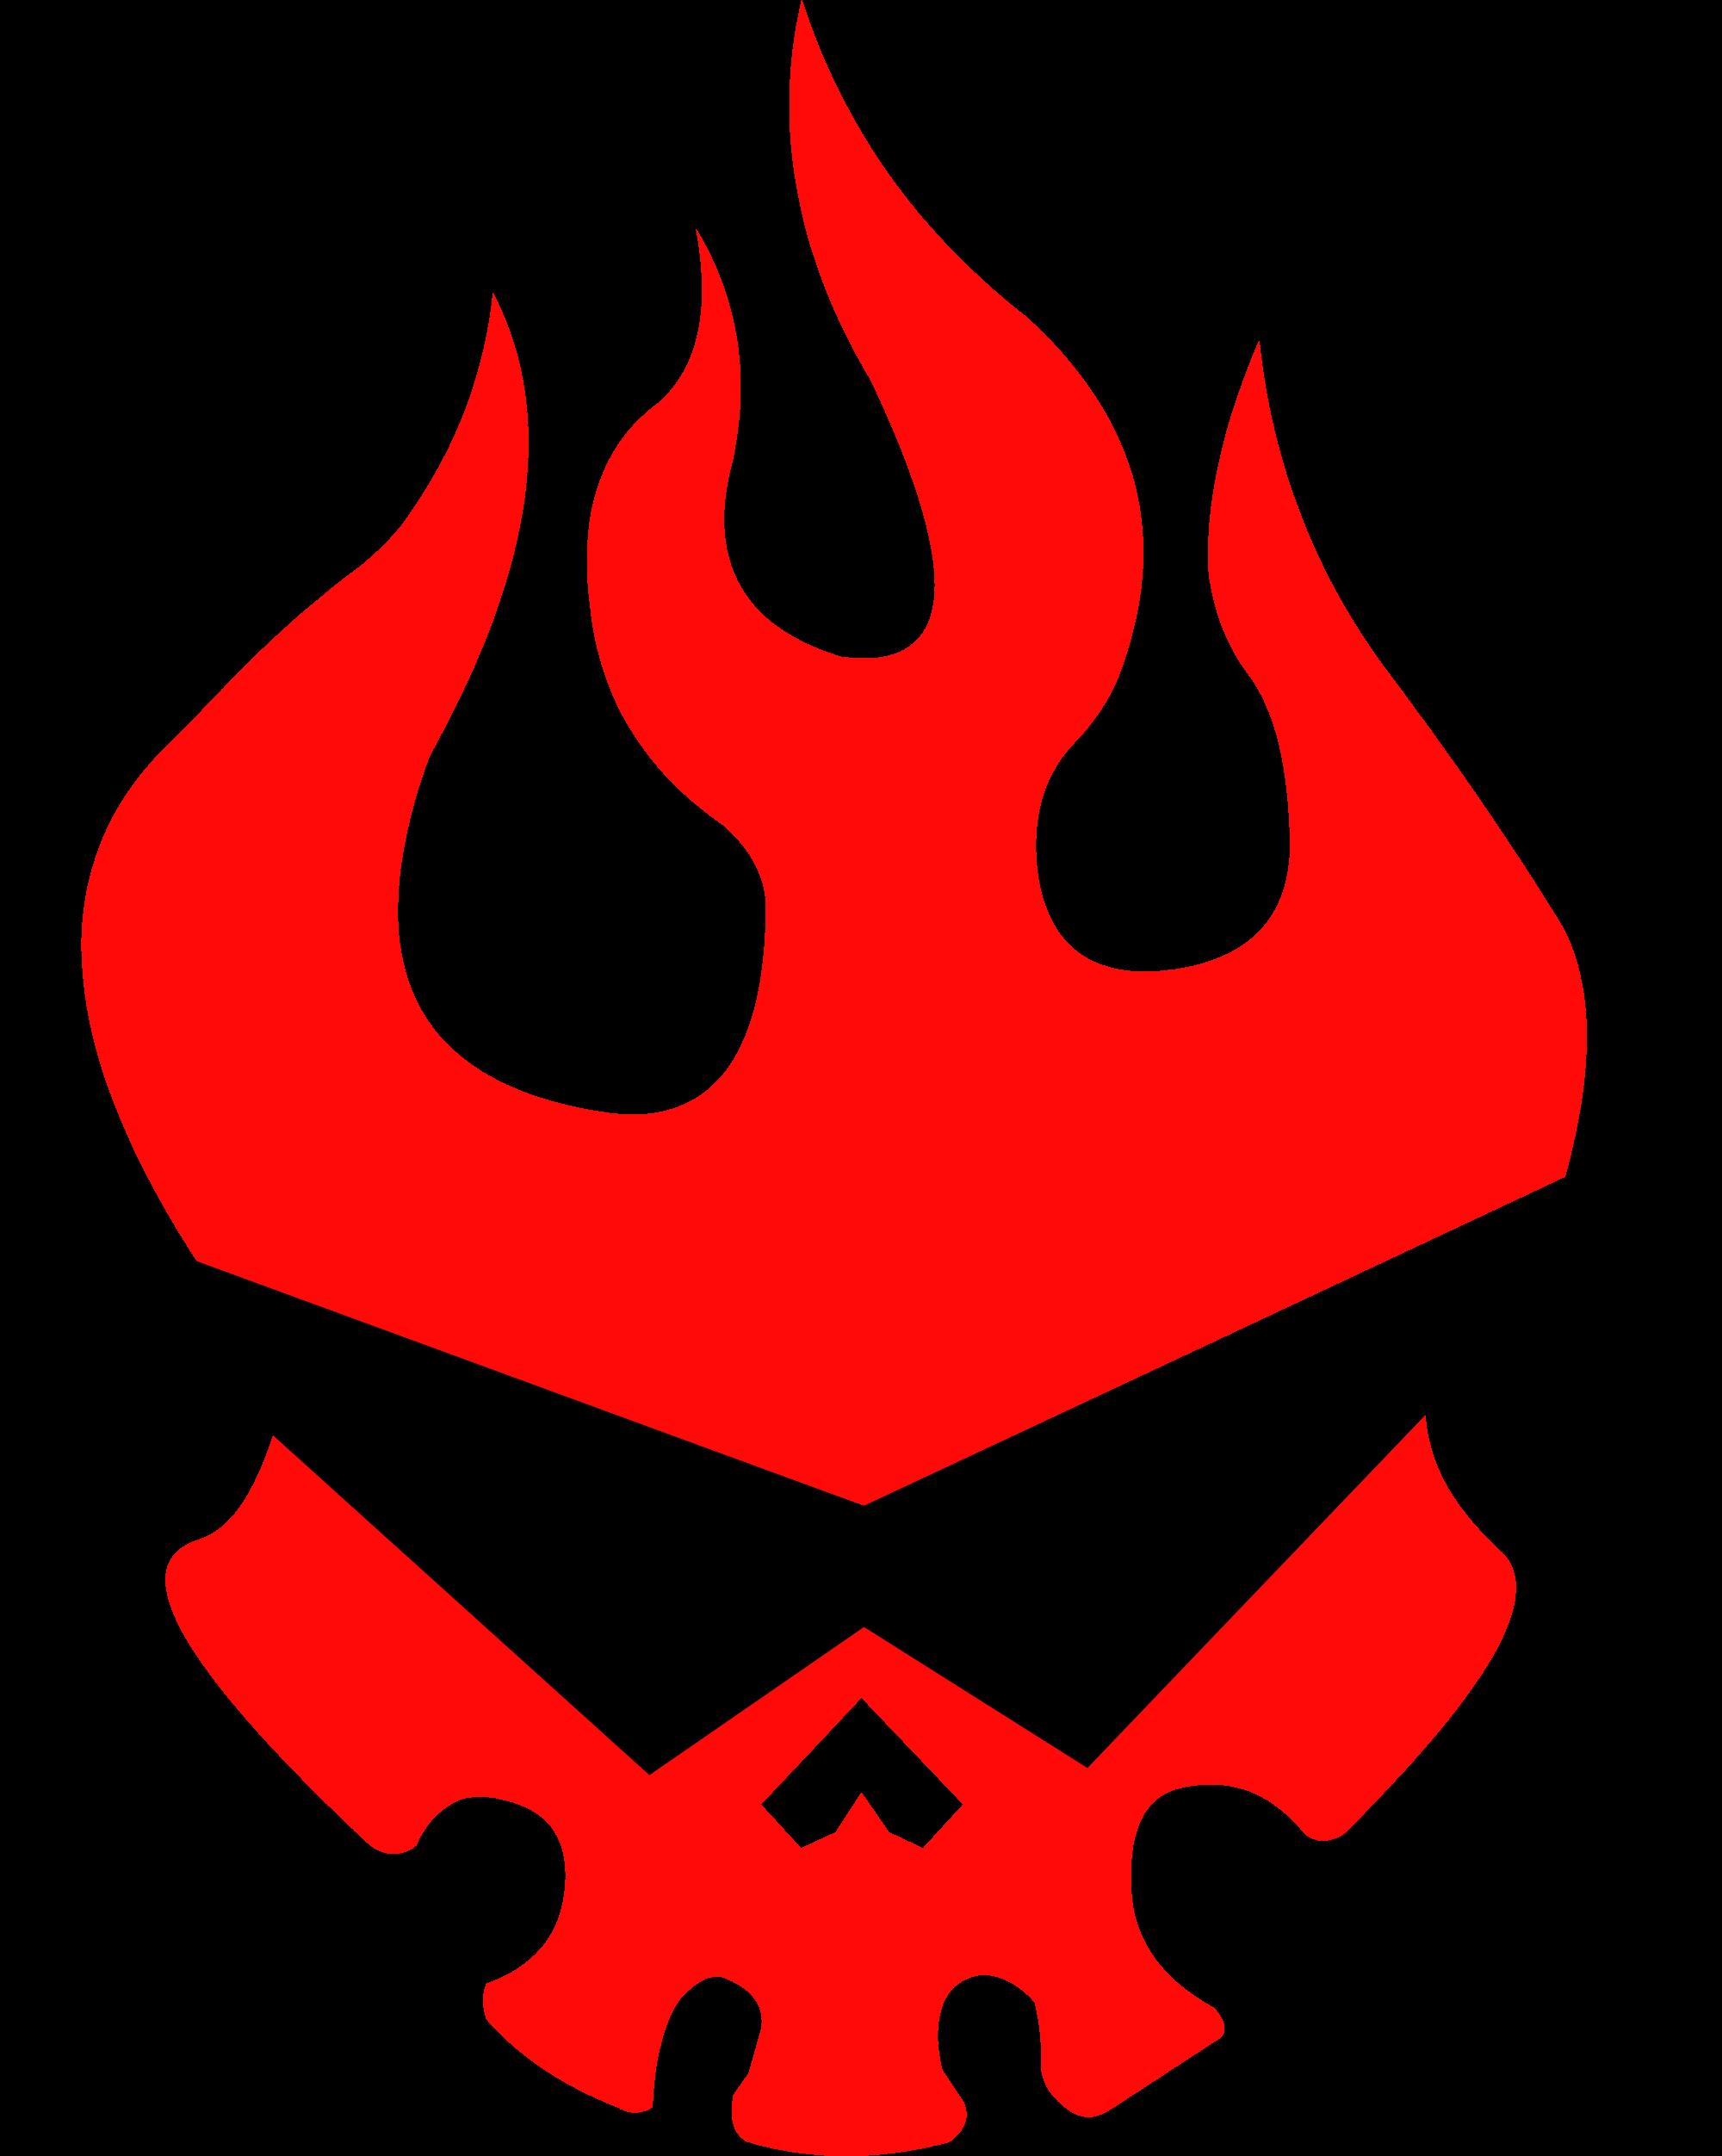 Anime Logos - ClipArt Best